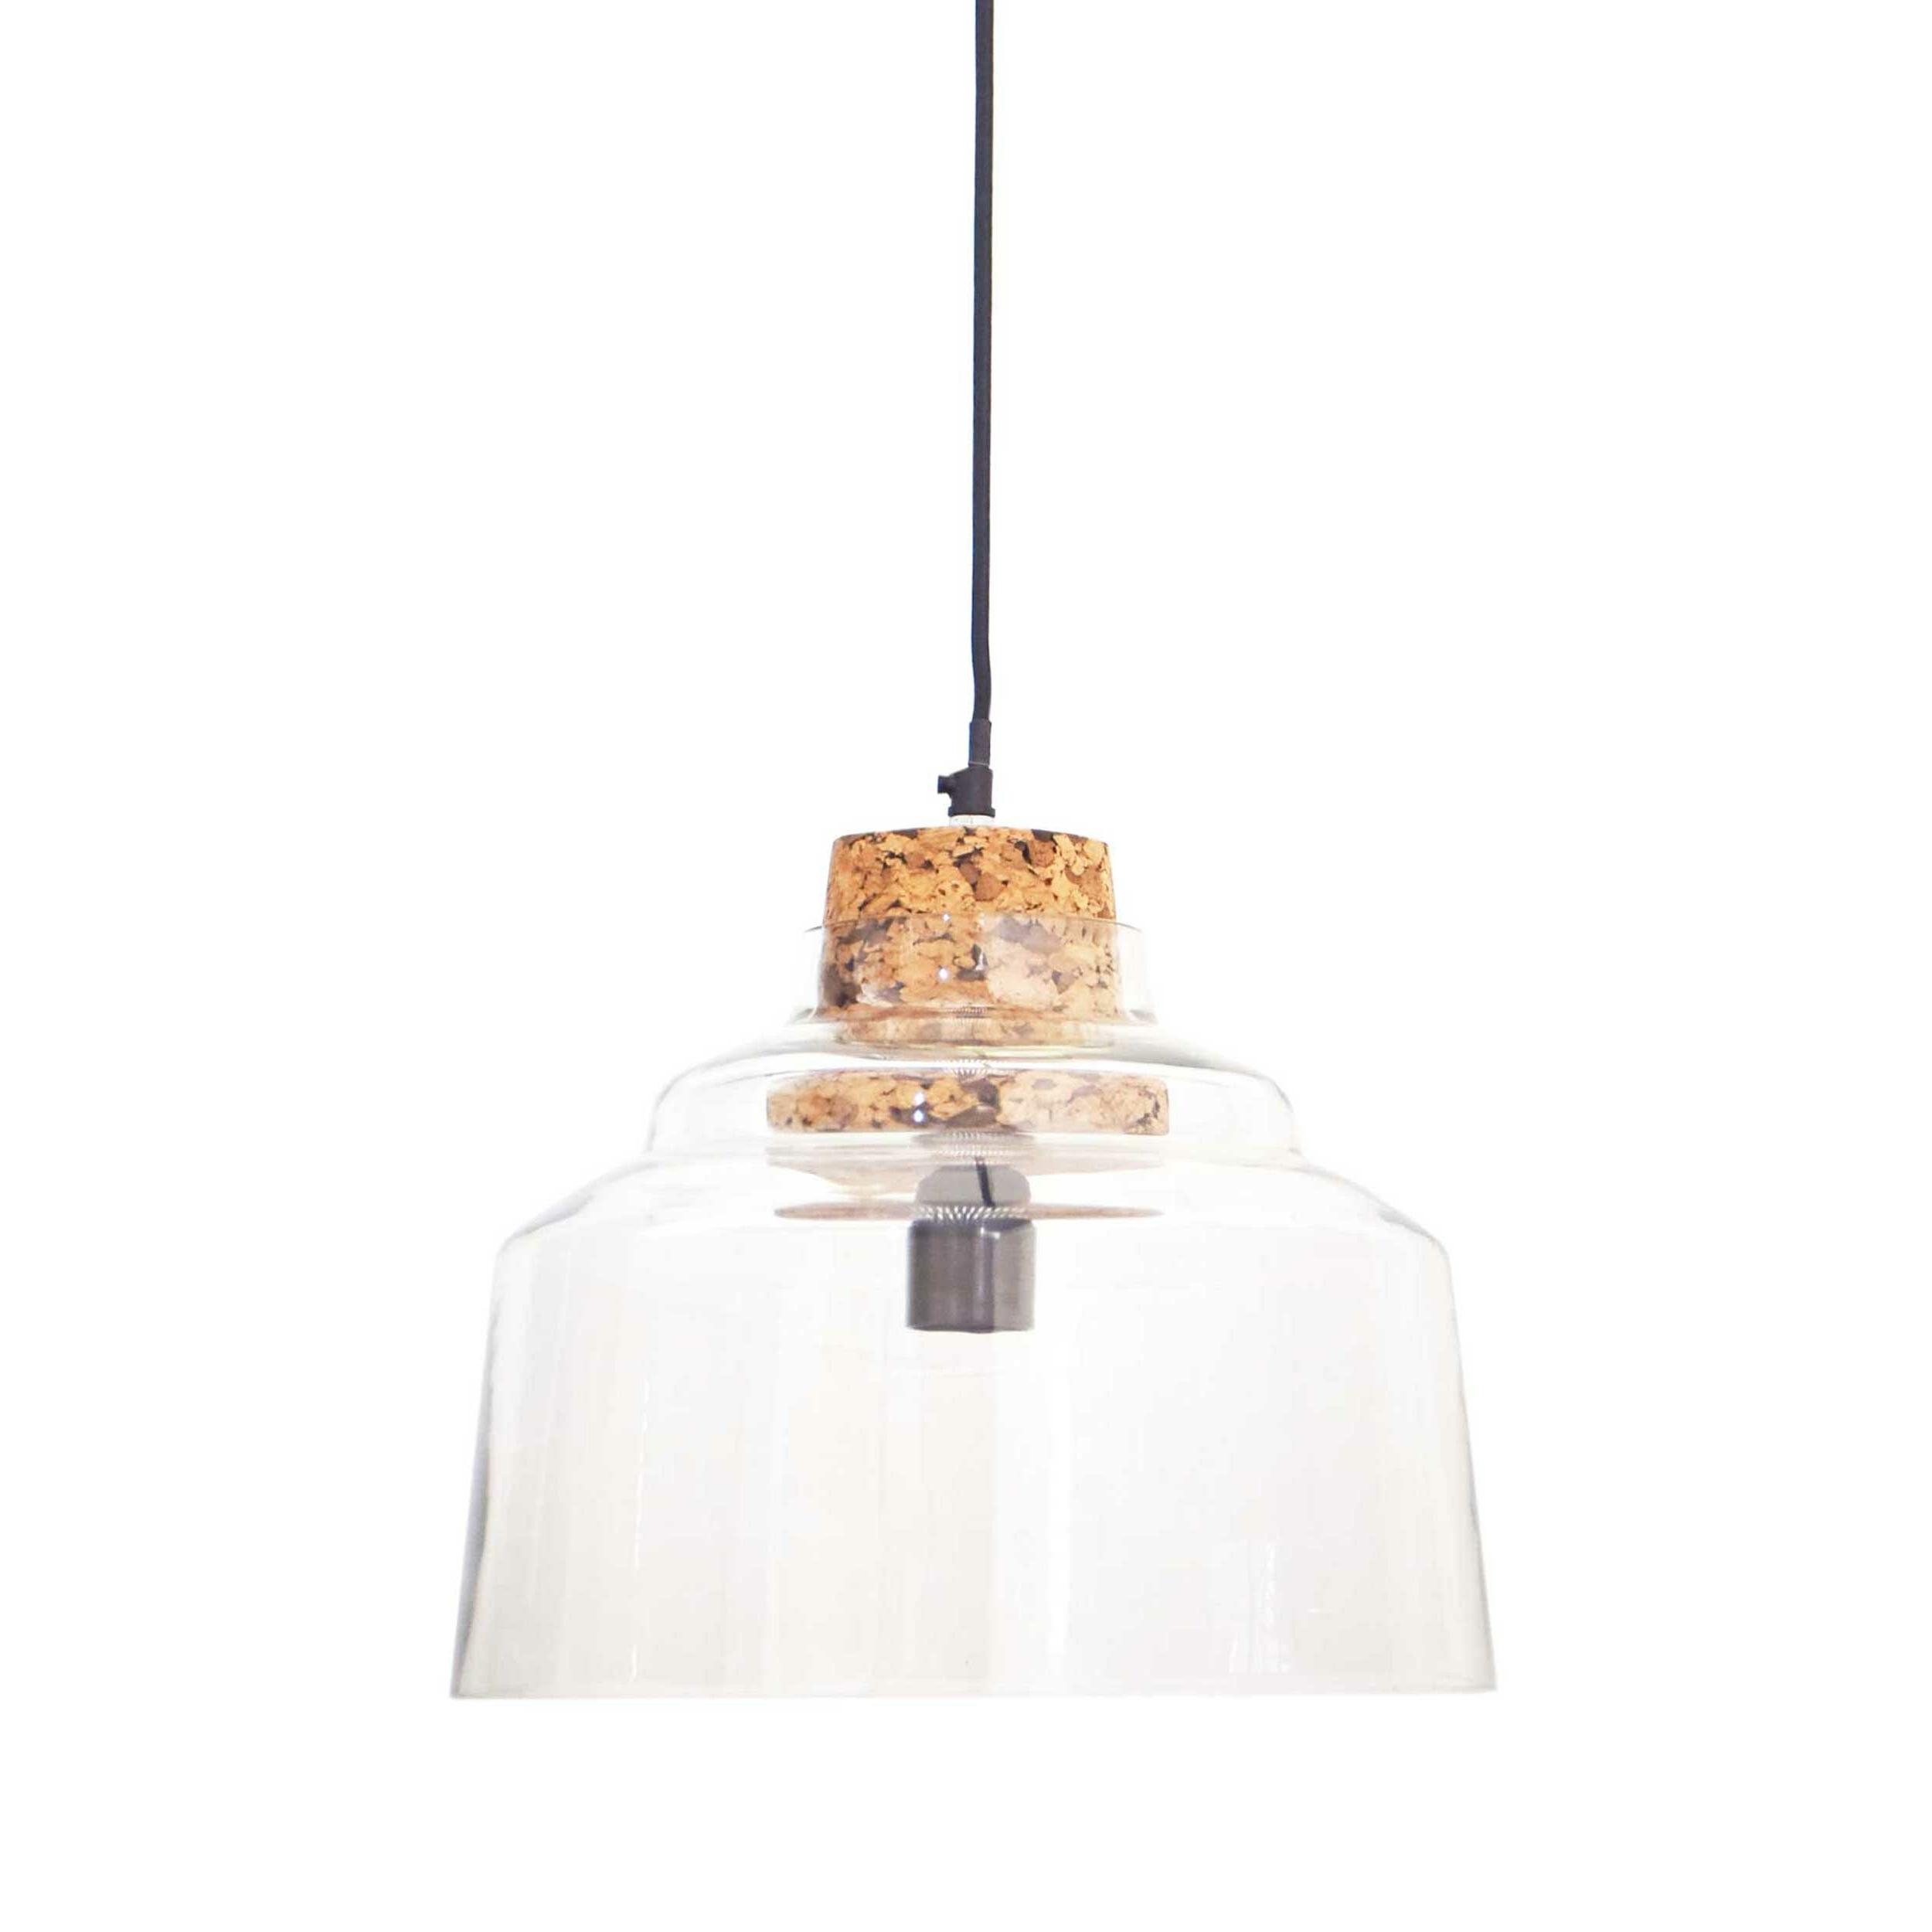 Fresno Dome 1 Light Bell Pendants Intended For Most Popular Jazelle 1 Light Single Bell Pendant (View 8 of 20)